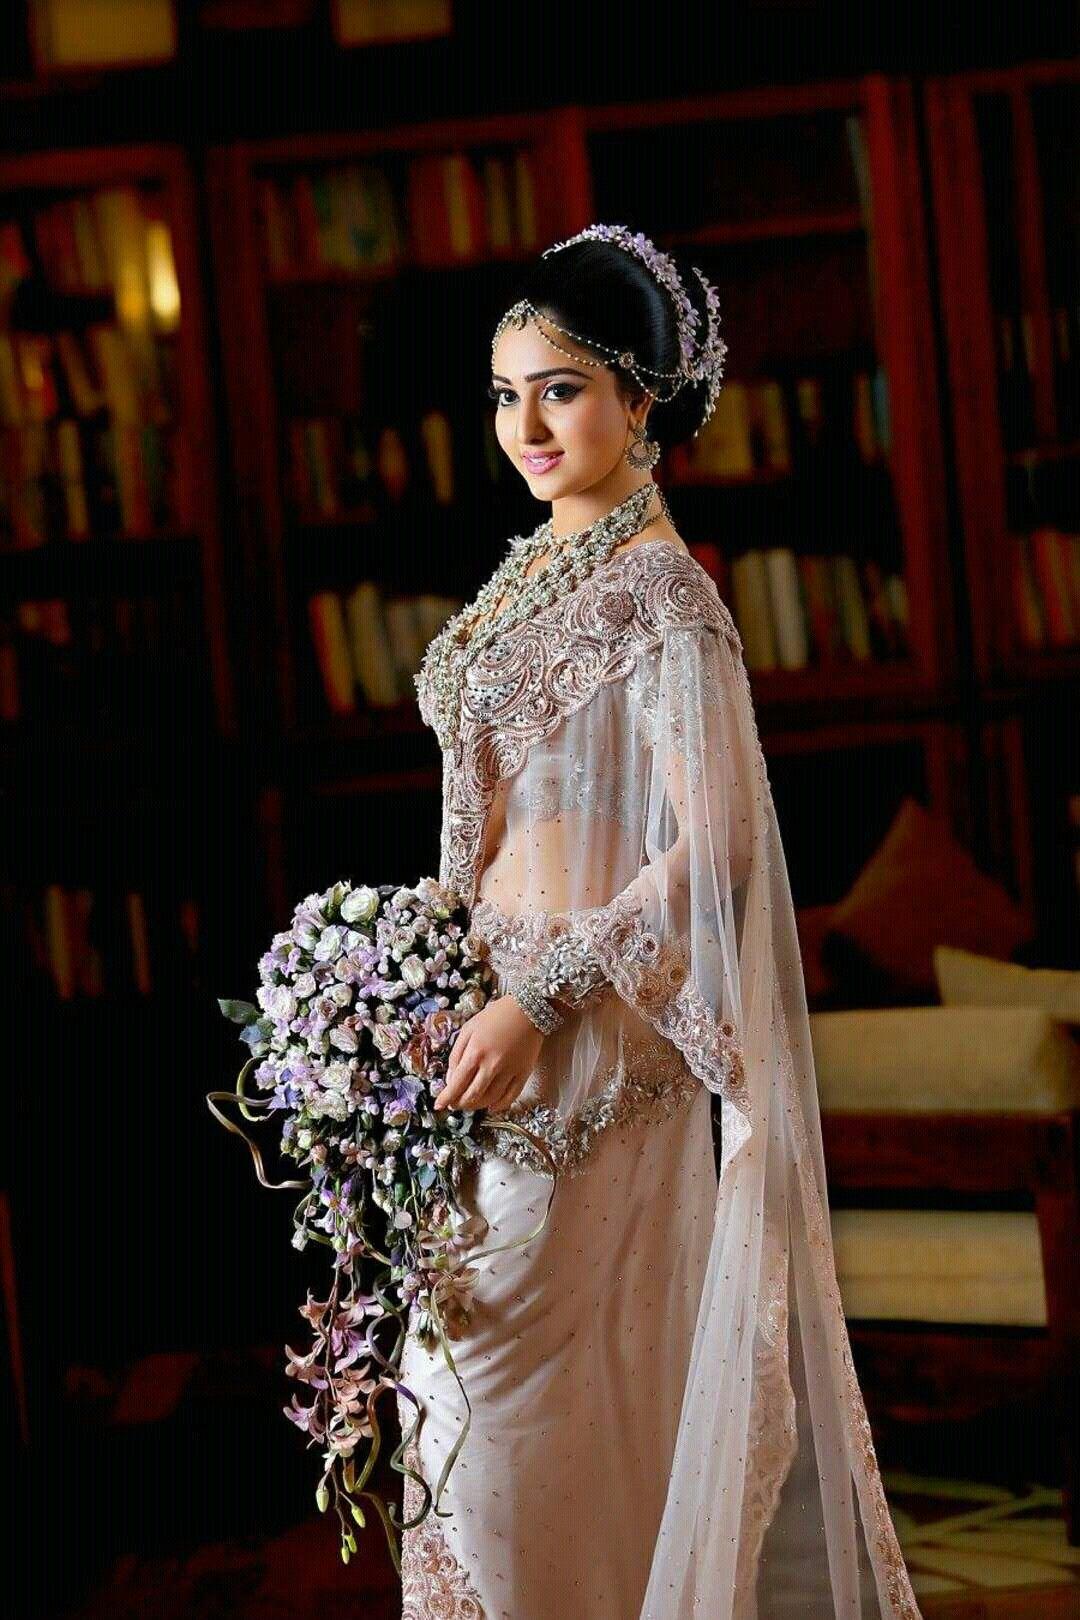 Bridal Lehenga Wedding Sarees Saree Jackets Poses White Designer Dresses Traditional Outfits Beautiful